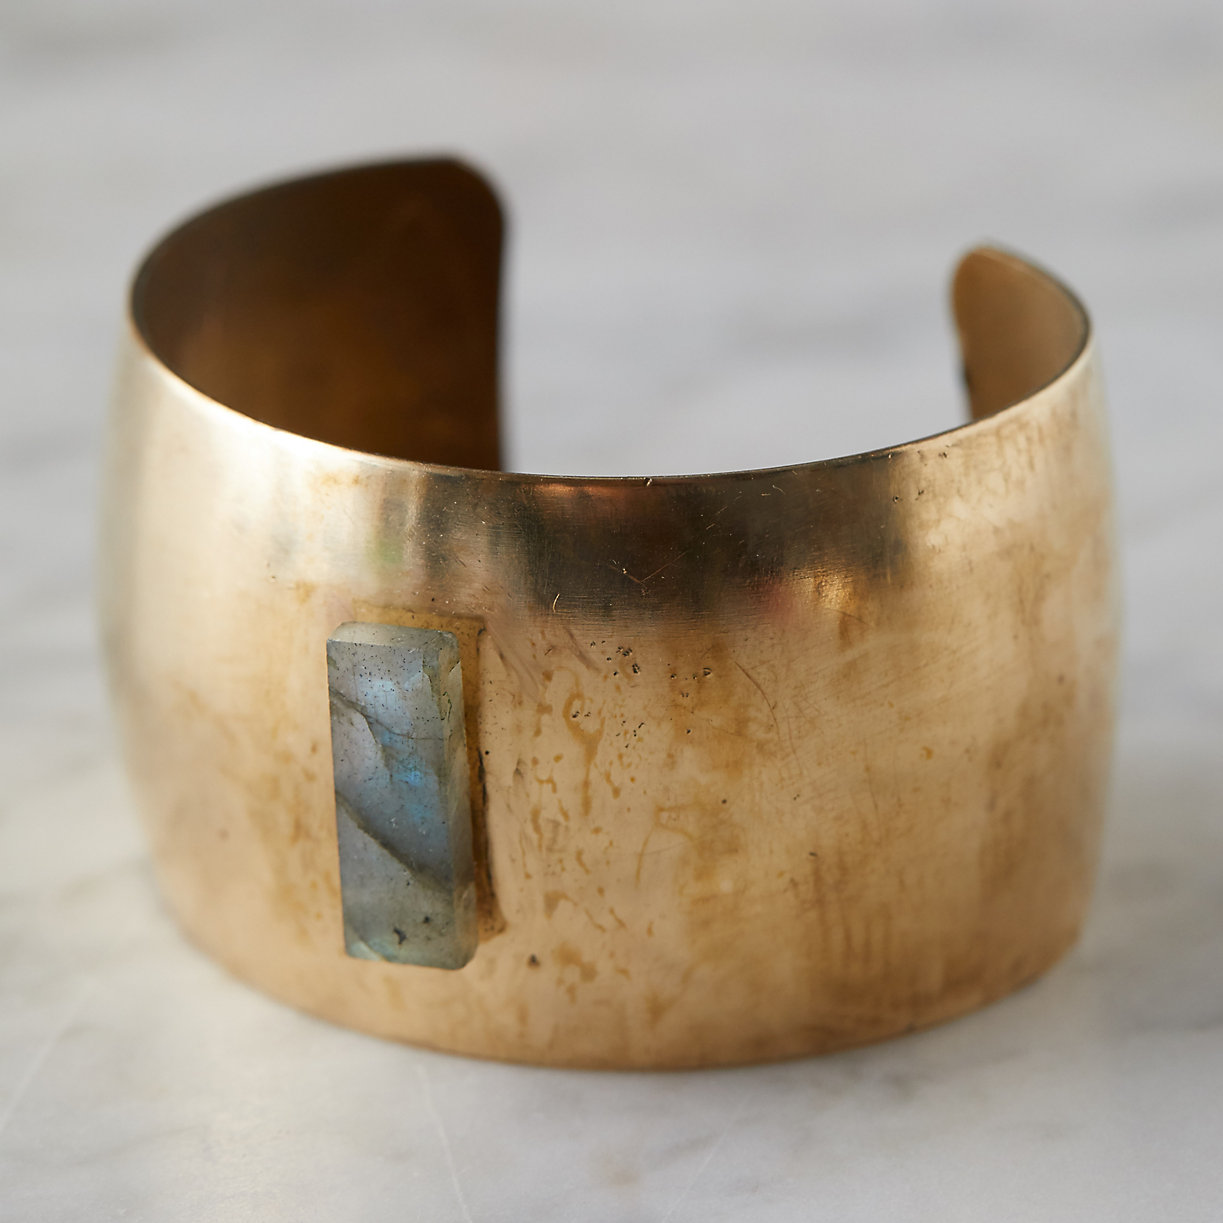 Labradorite + Brass Cuff - Terrain